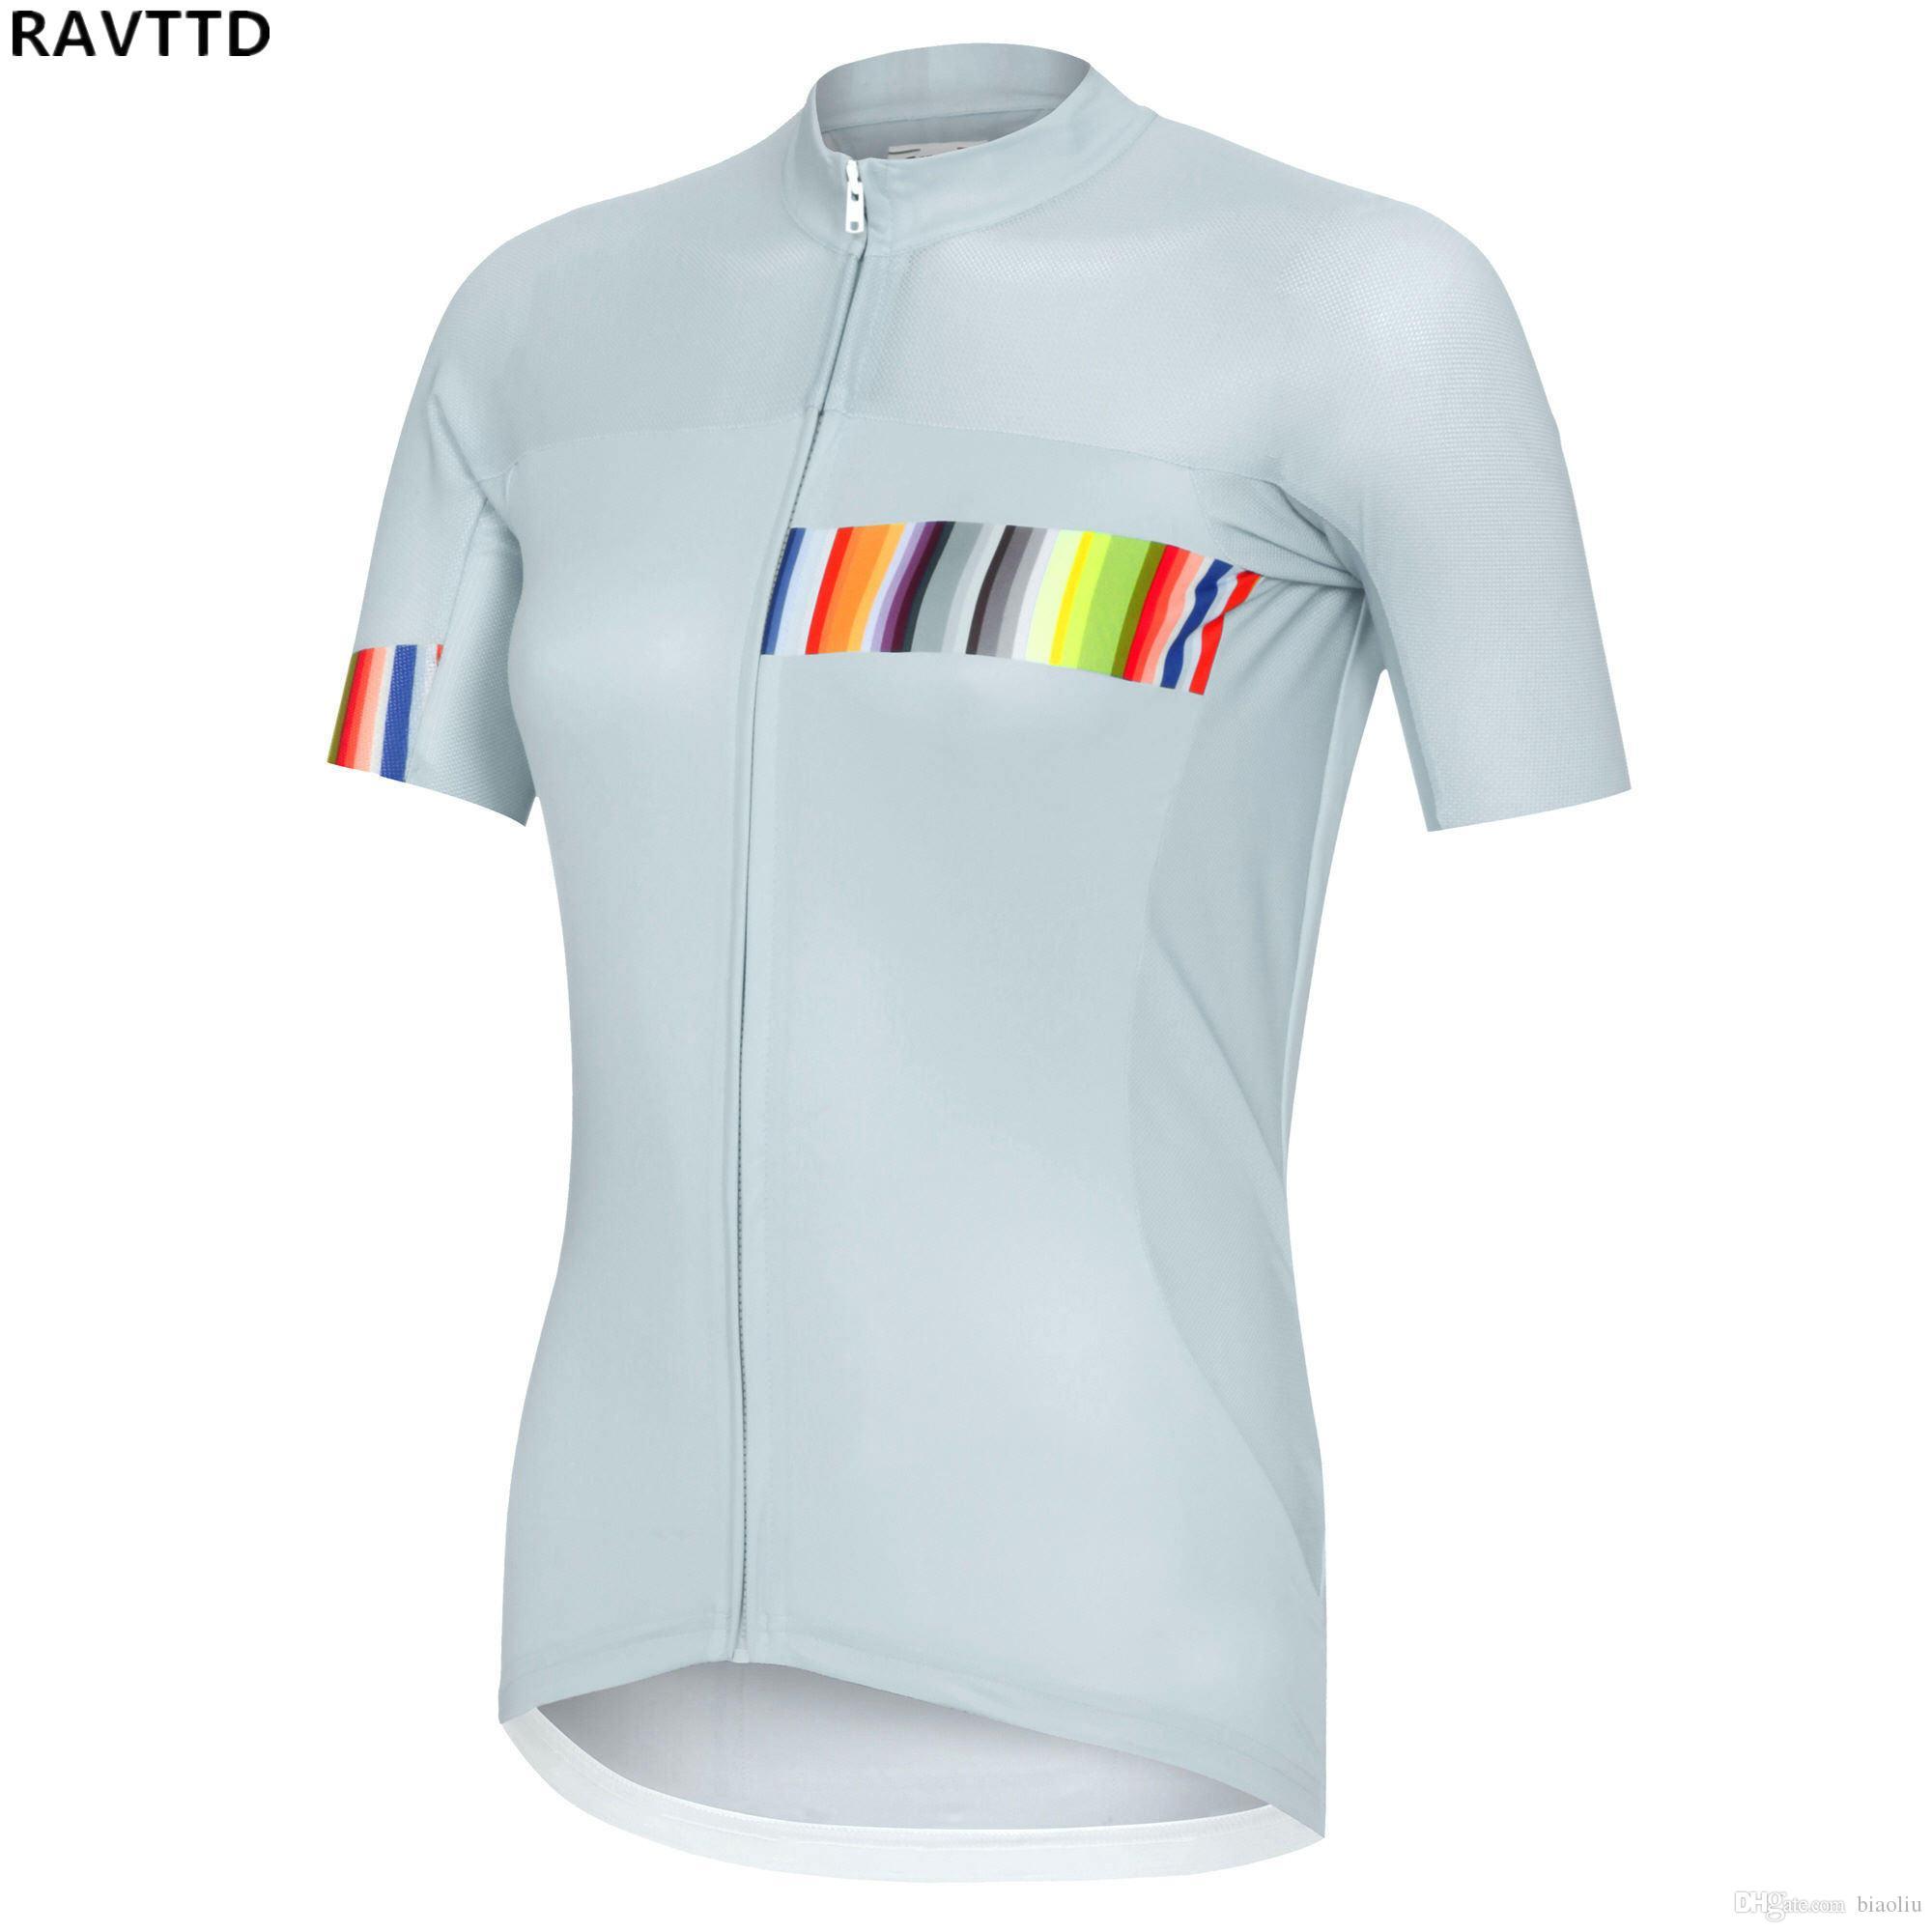 Summer Women Bike Short Sleeve Cycling Jersey Pro Team Outdoor Mountain  Bicycle Uniform Shirt Clothing Wear MTB Clothes Cycling Clothing Cycling  Wear Online ... c395d9466